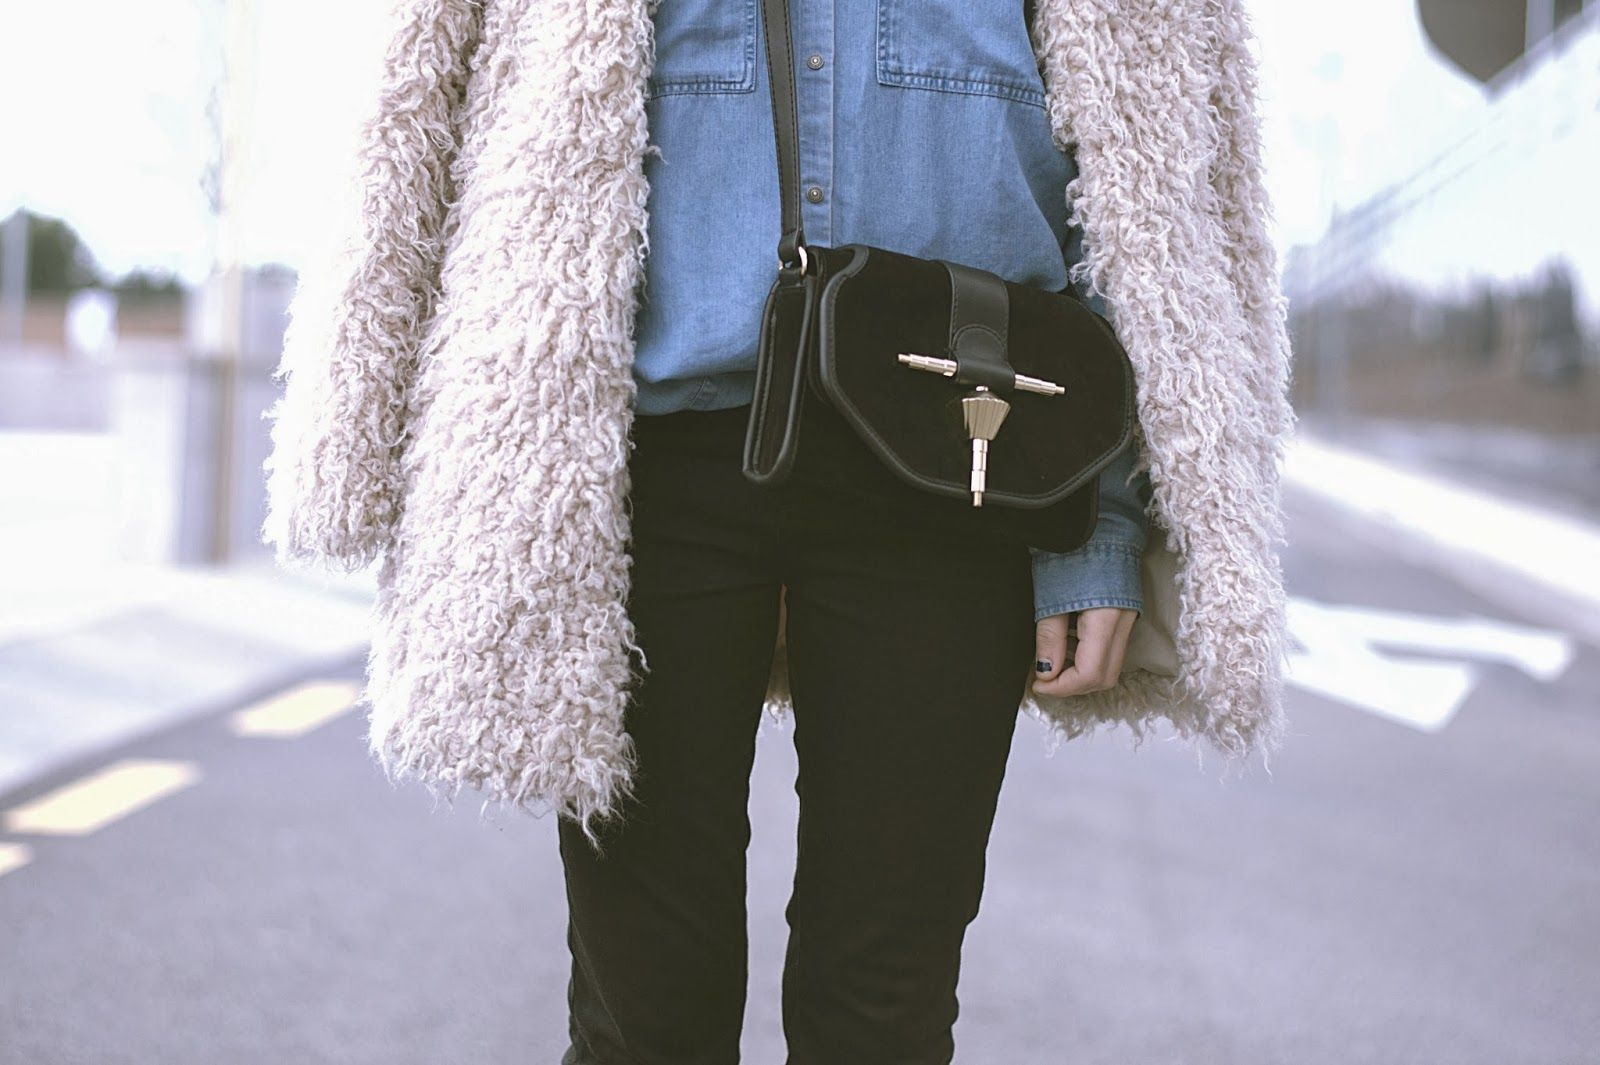 Jeans Zara - AW 13-14 Camisa/Shirt Zara - Old Abrigo/Coat Zara - Old Bolso/Bag Zara - AW 13-14